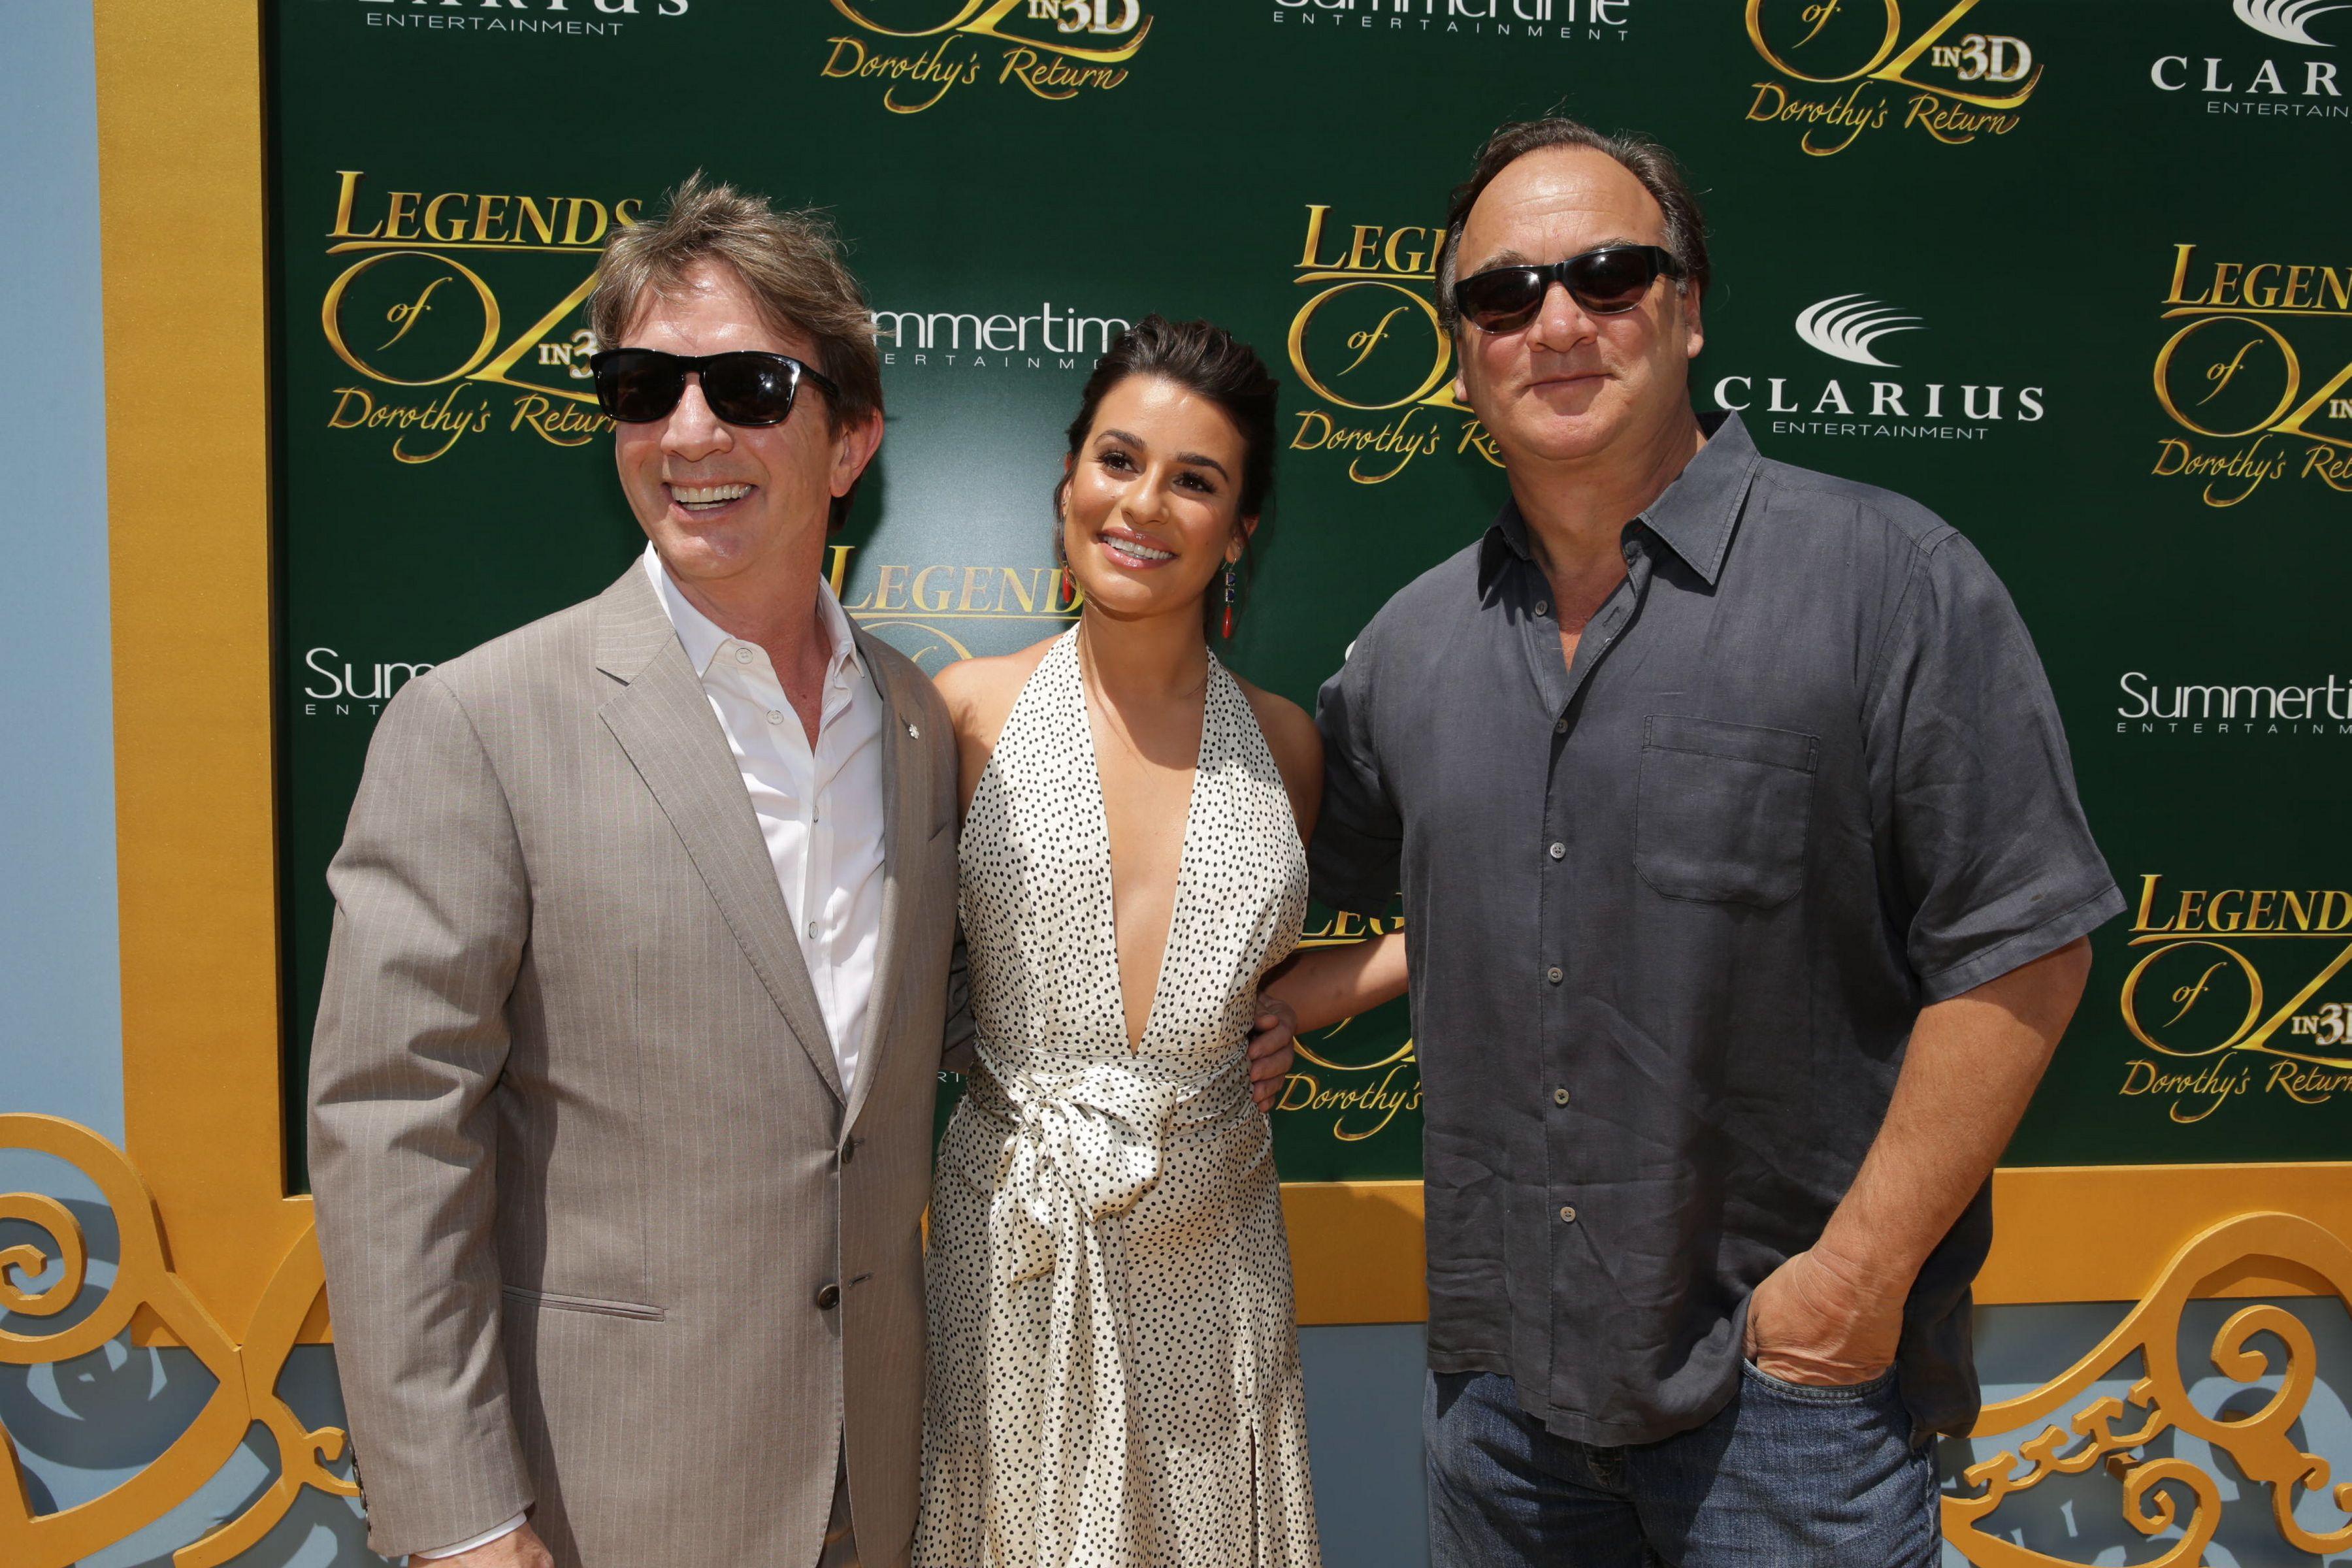 Cast Members Martin Short, Lea Michele and Jim Belushi at